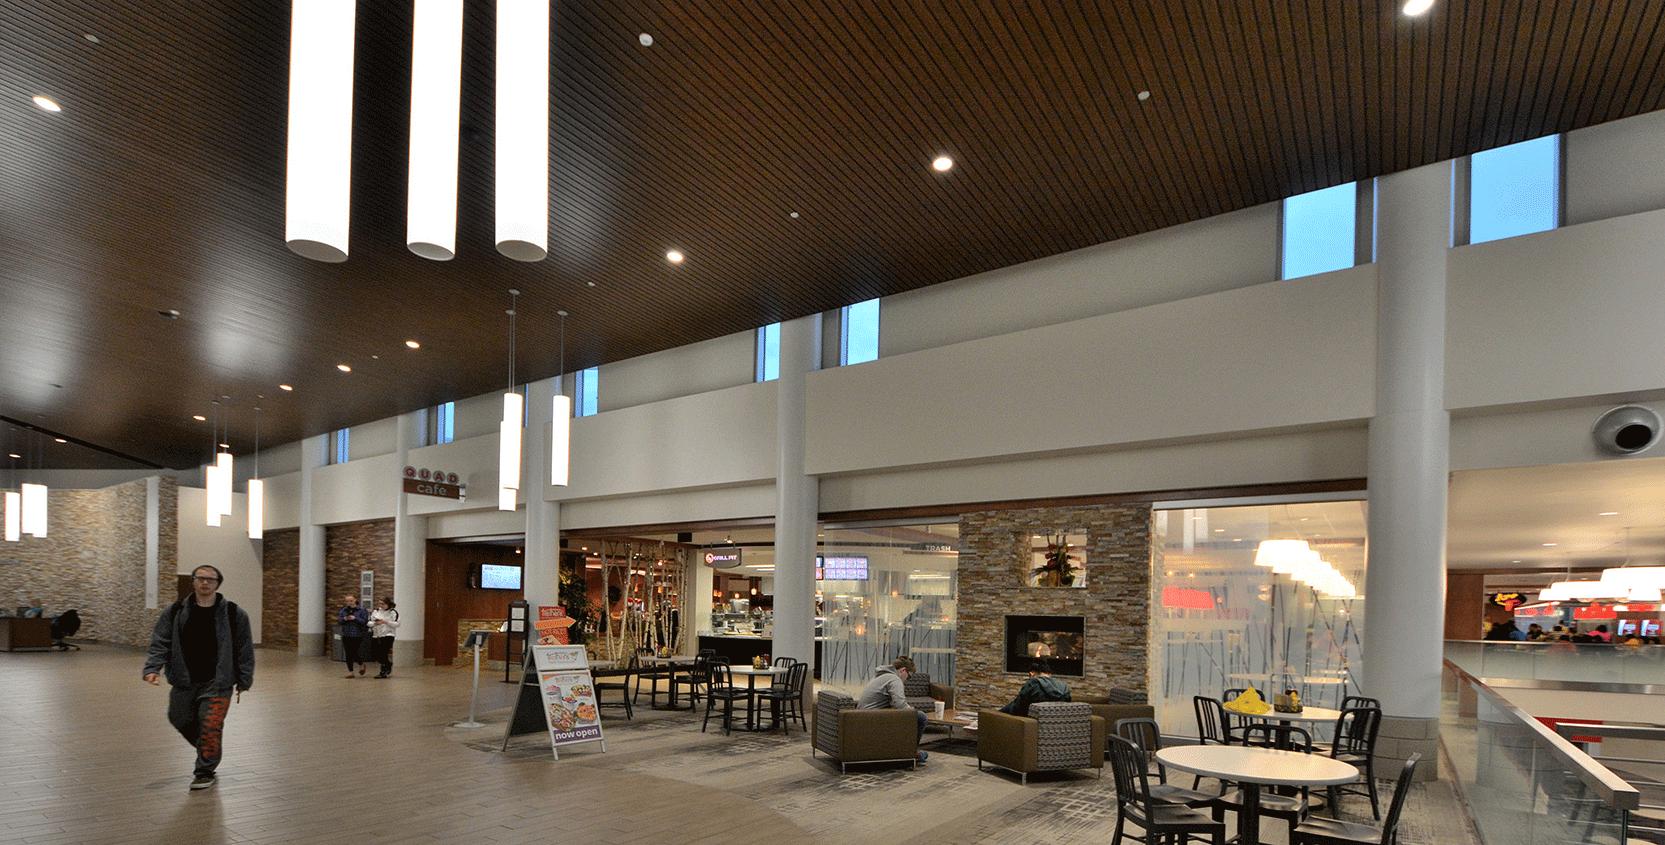 Ferris-State-University-University-Center-Food-Court-Entrance-1665x845